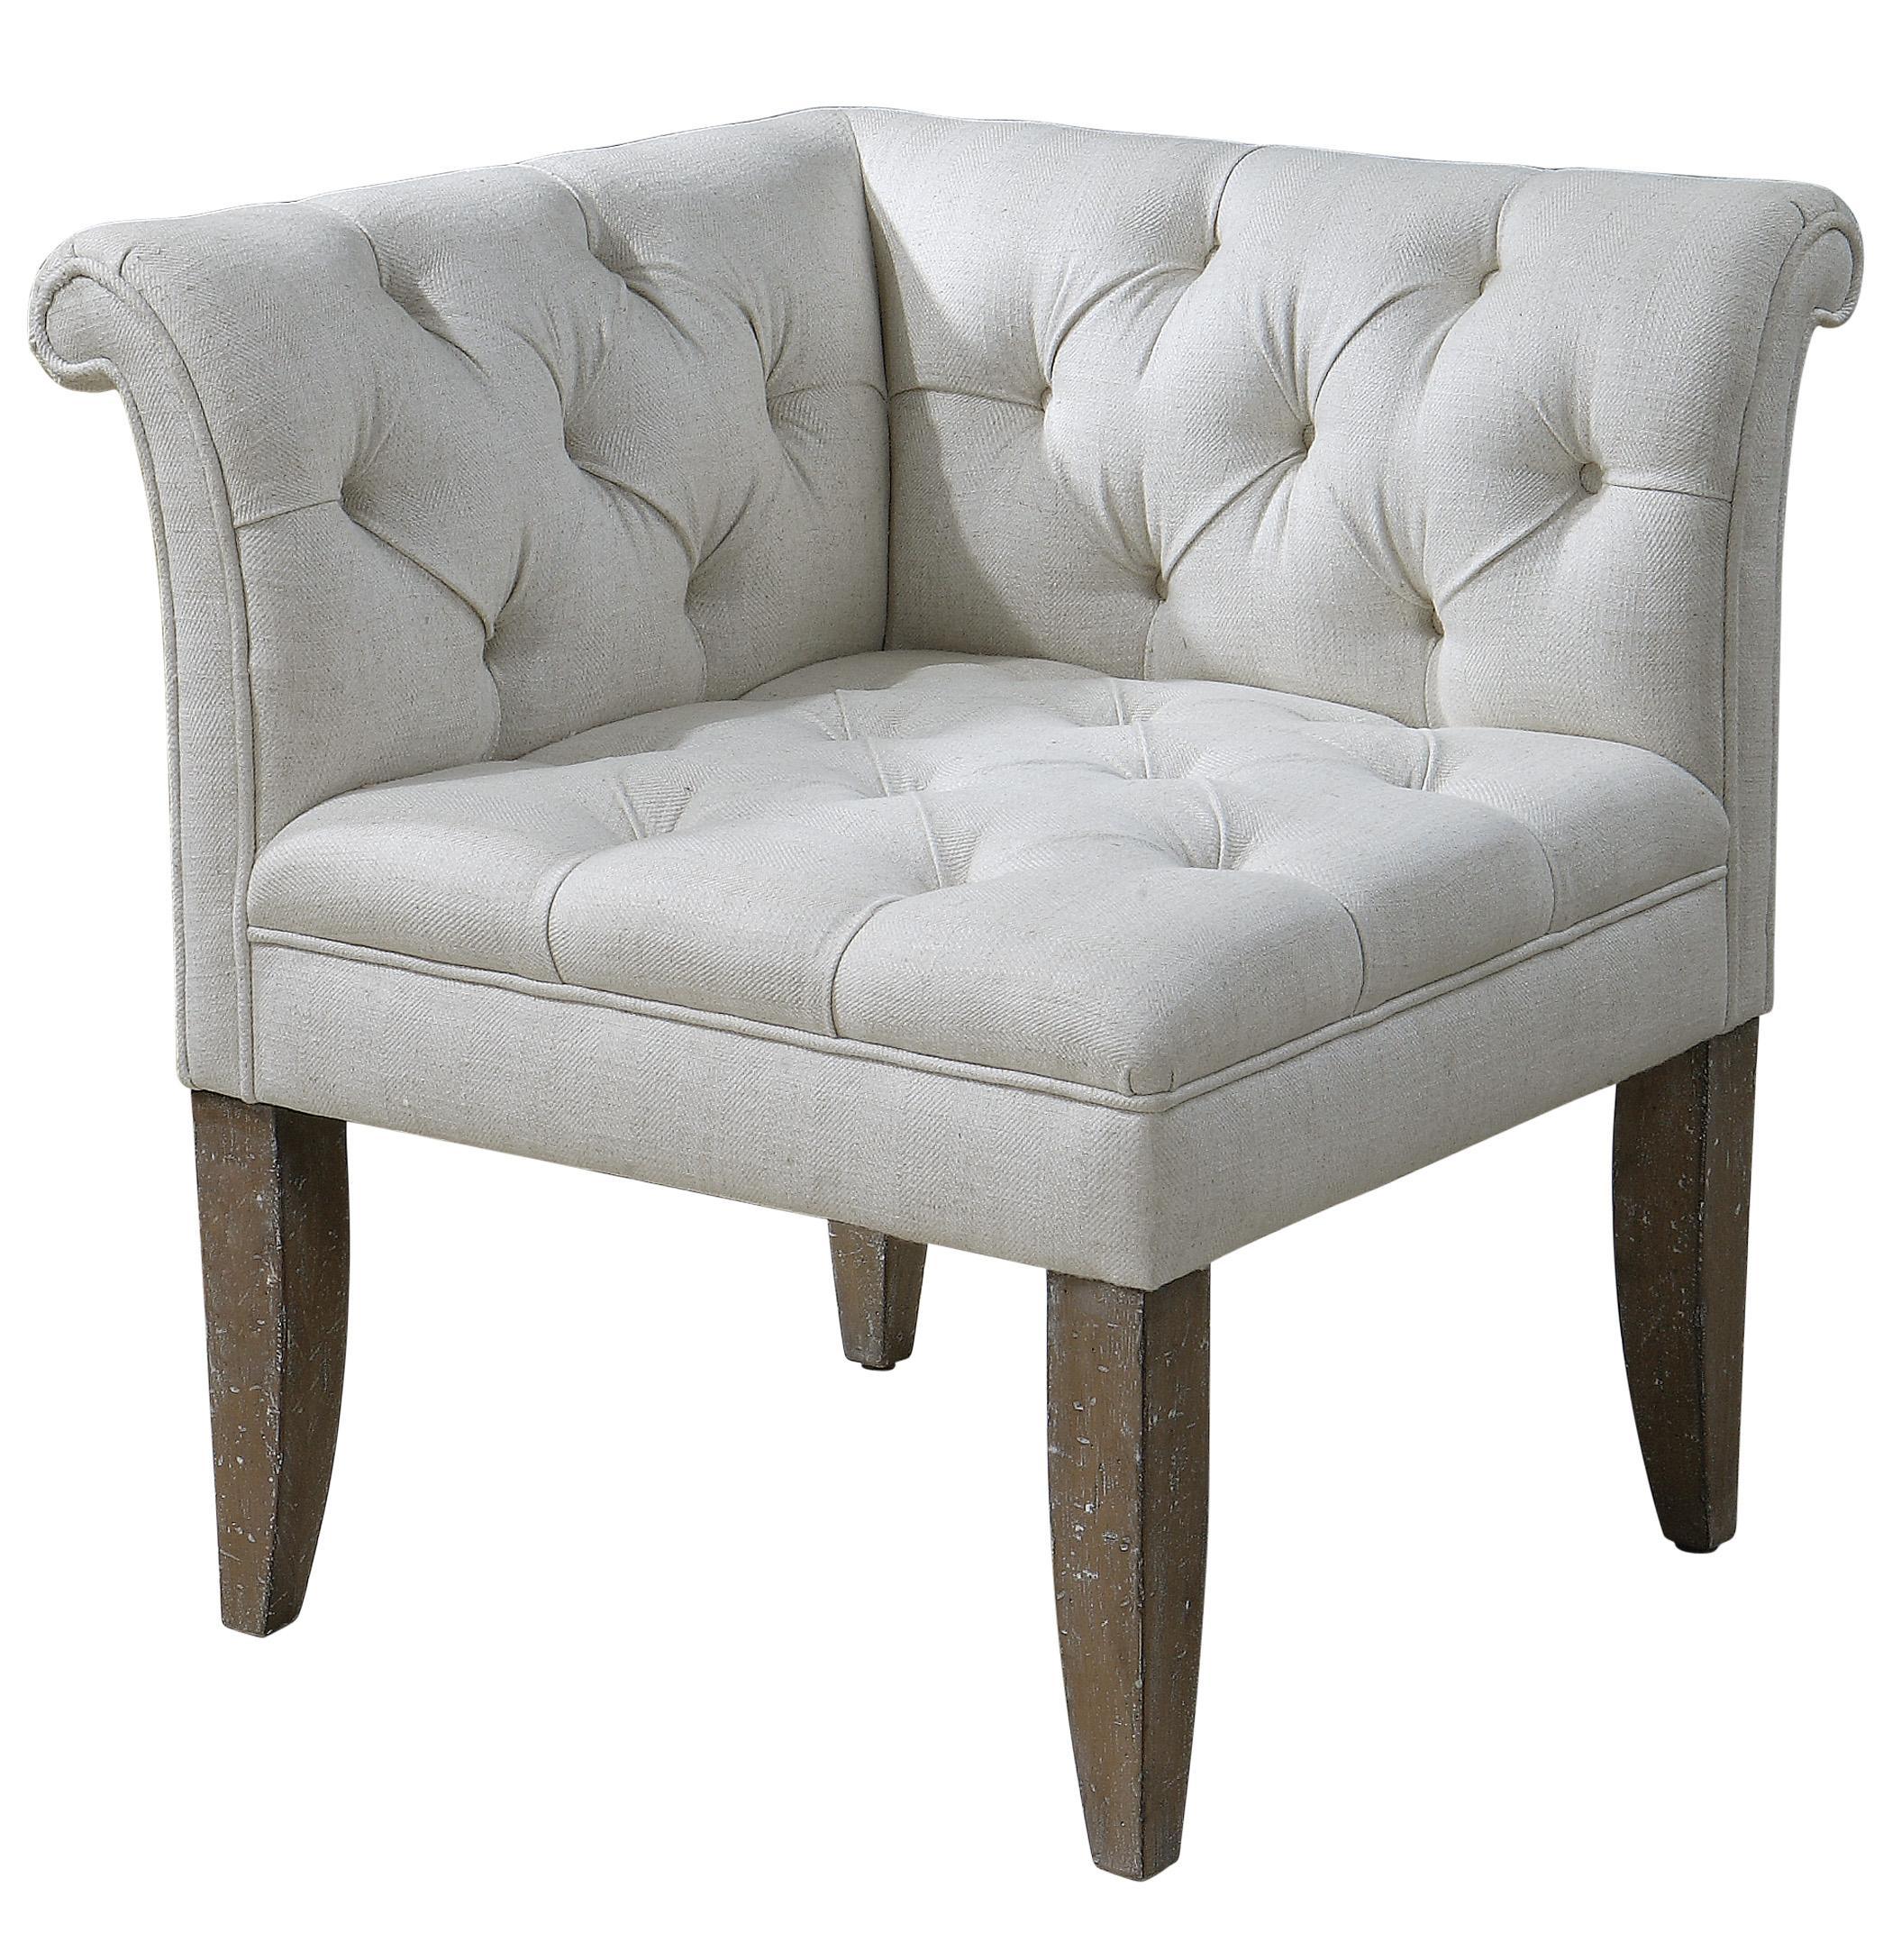 accent sofa sofas u love reviews uttermost furniture chairs 23125 tahtesa corner chair